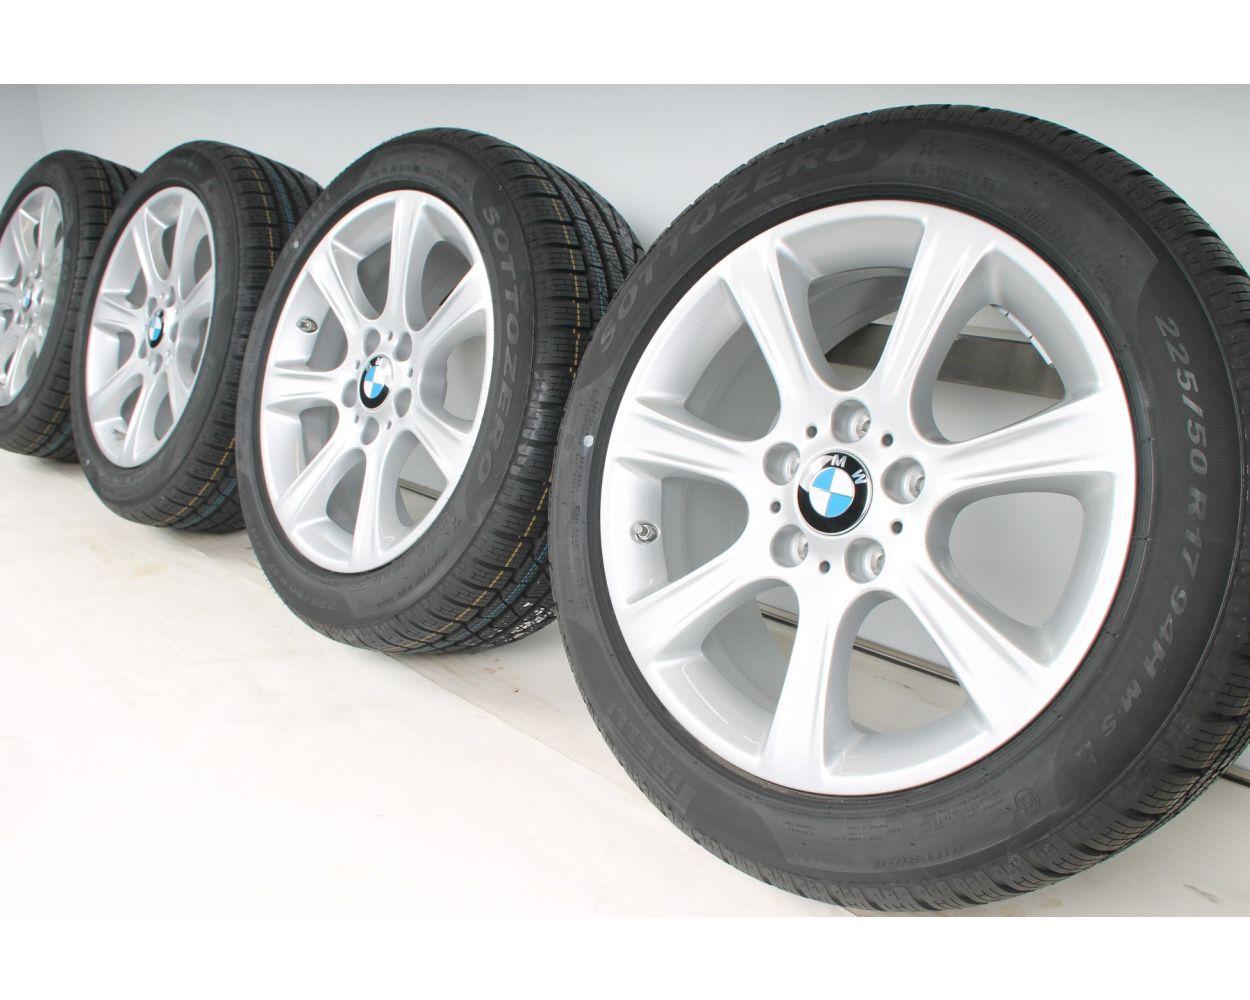 Bmw Winter Wheels 3er F30 F31 4er F32 F33 F36 17 Zoll 392